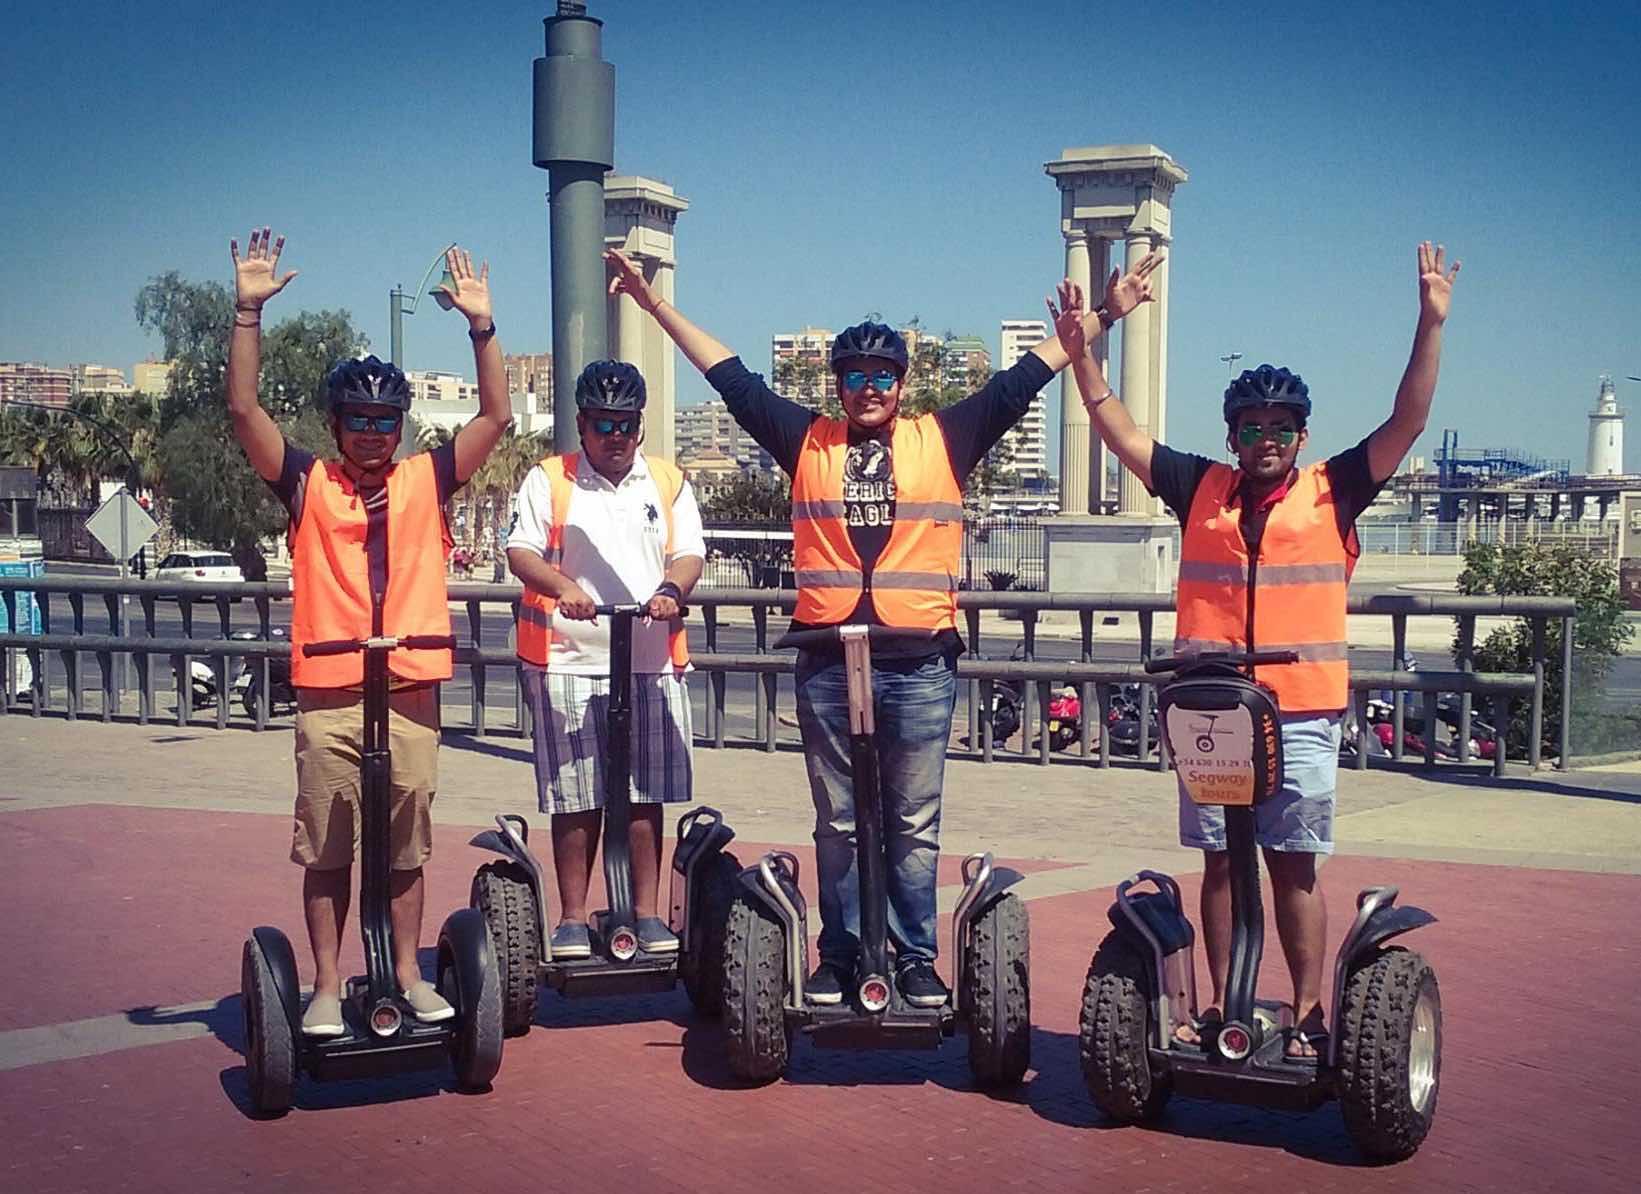 Segway Malaga Tours for families